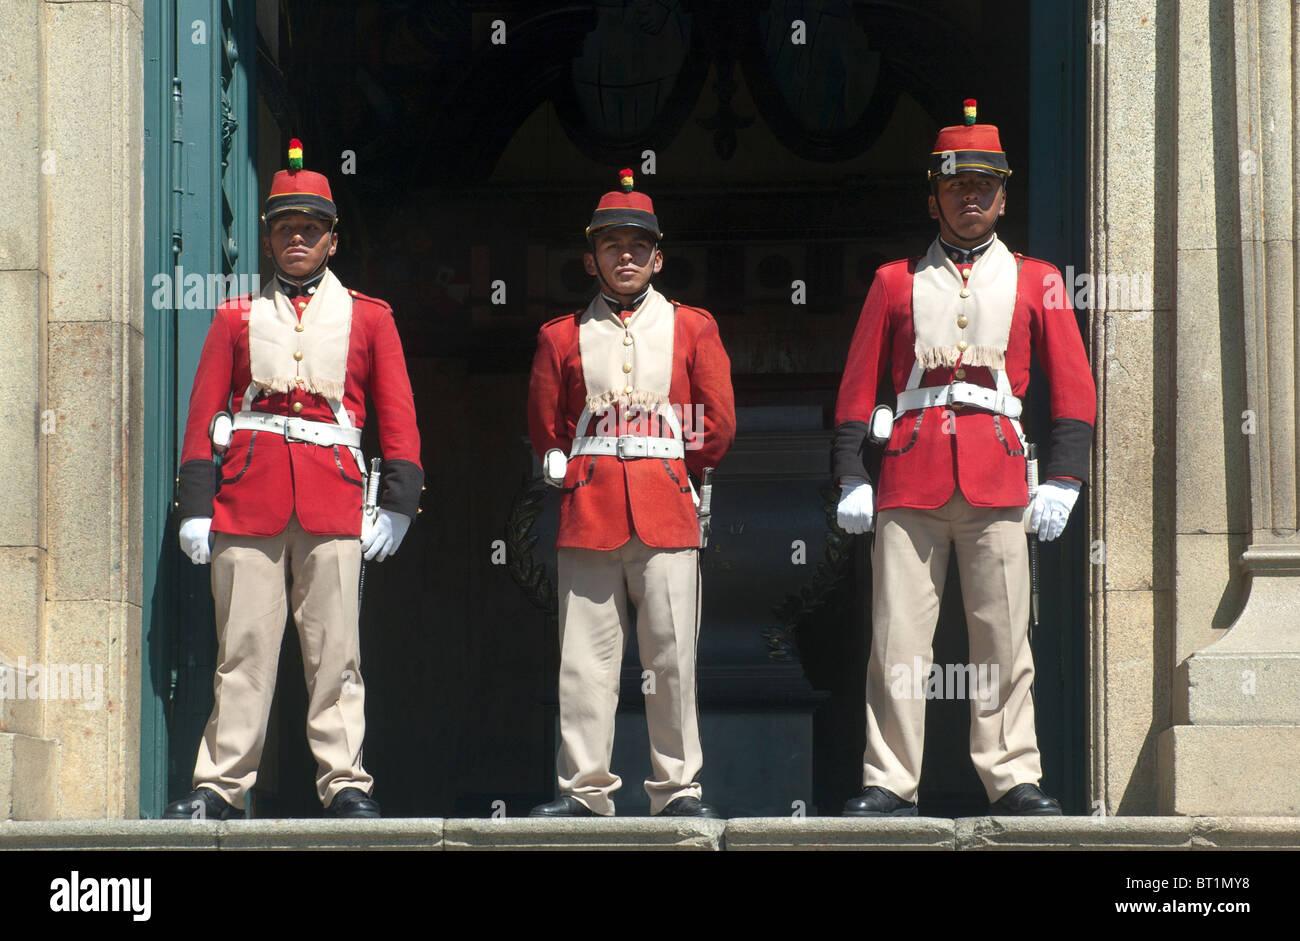 The Guard, outside the Presidents Building, Murillo Plaza, La Paz, Bolivia. - Stock Image